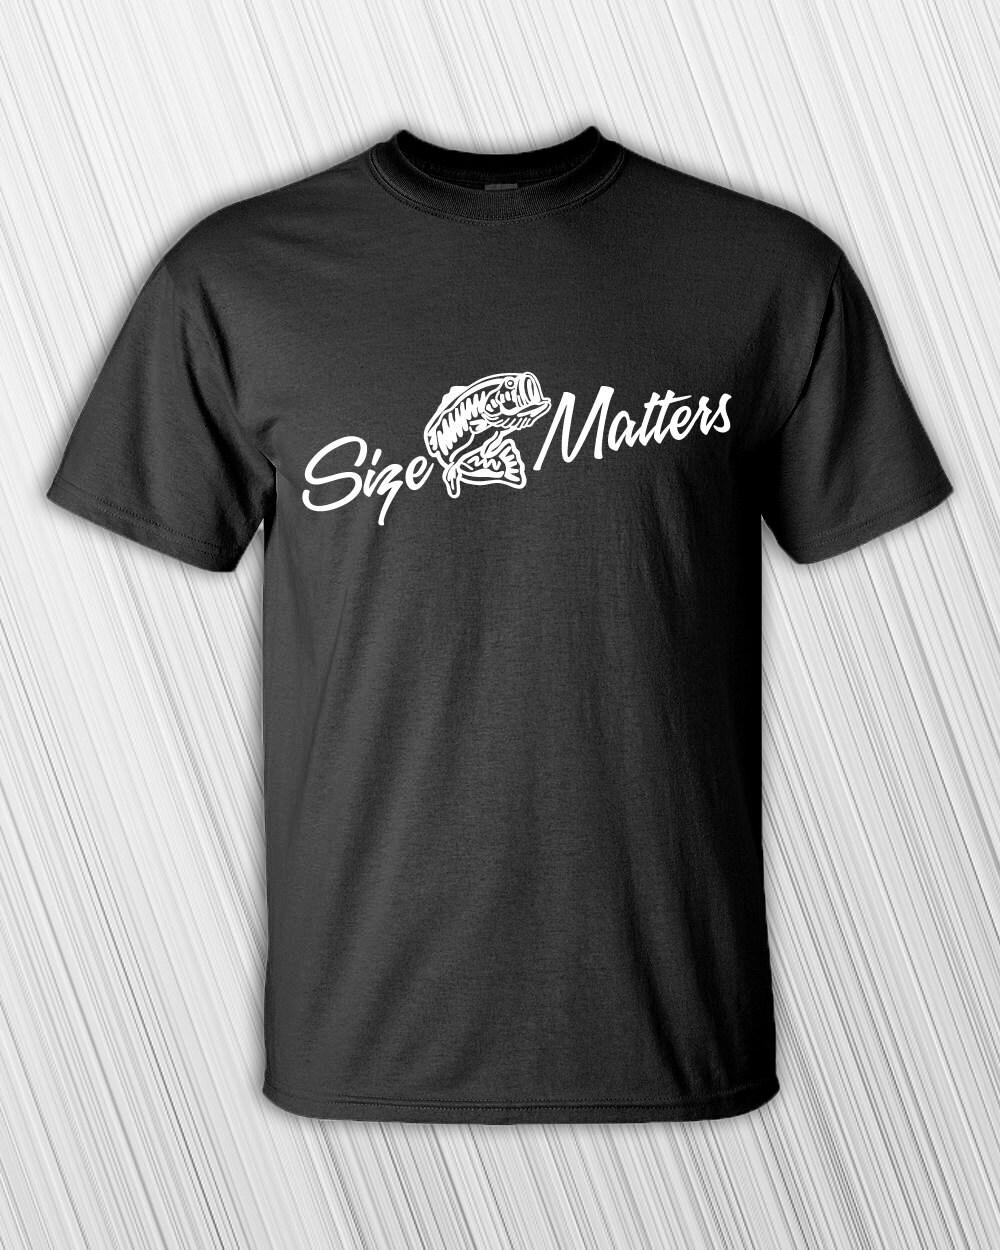 Father's Day Gift Size Matters Fishing Shirt T-shirt